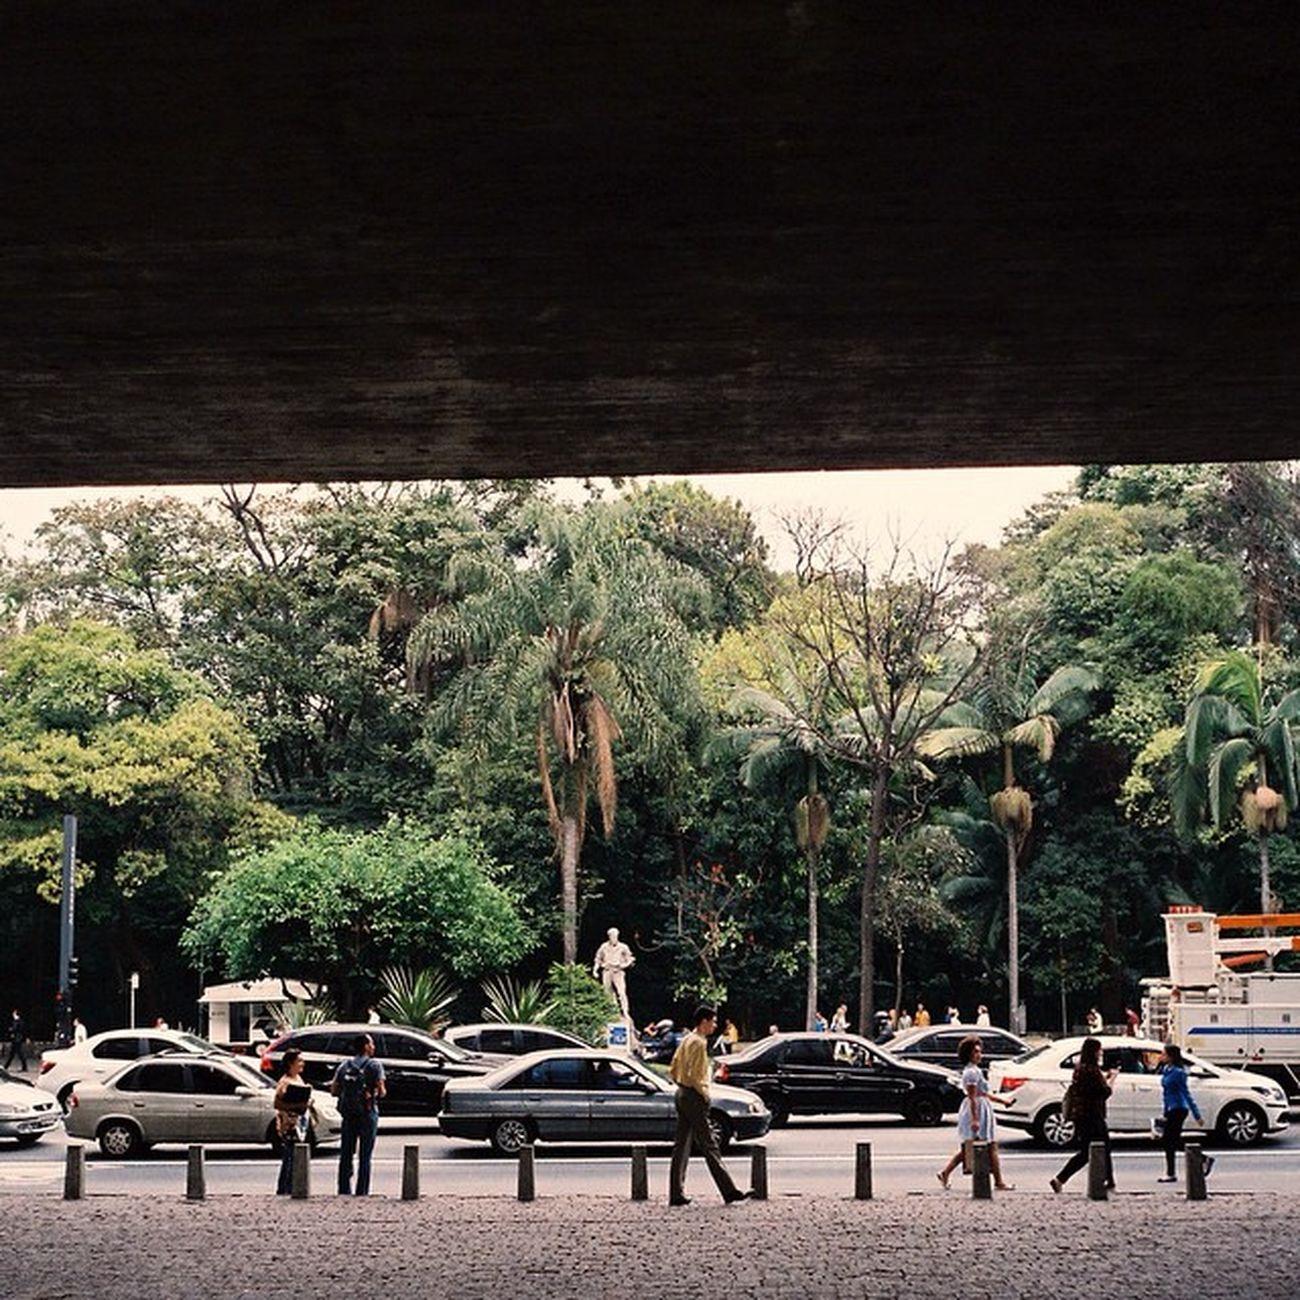 Saopaulo Brasil Brazil Contax T3 Cymera Cymeraapp People